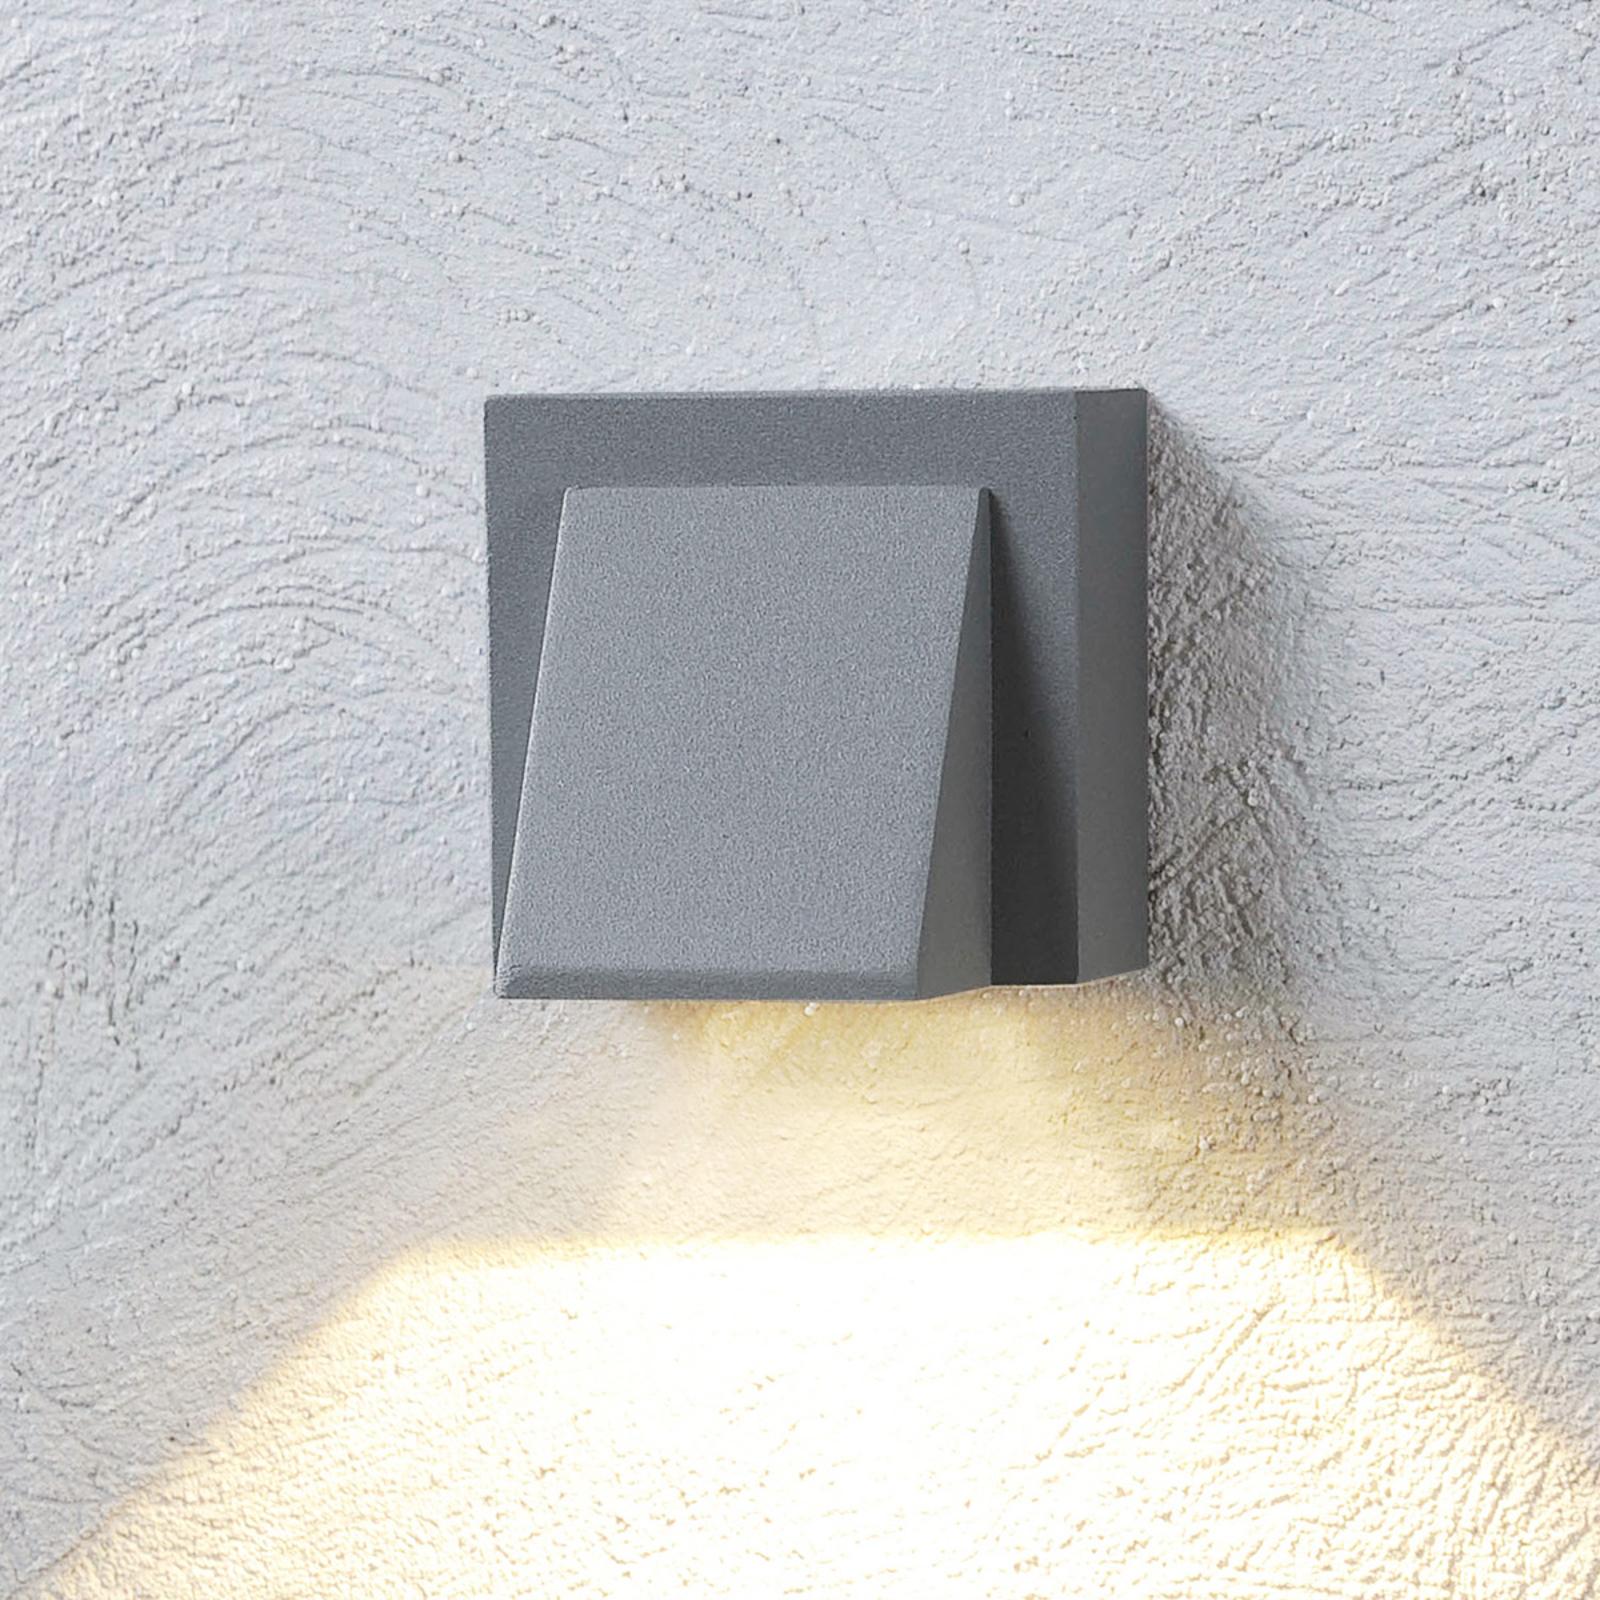 Sølvgrå LED-utevegglys Marik